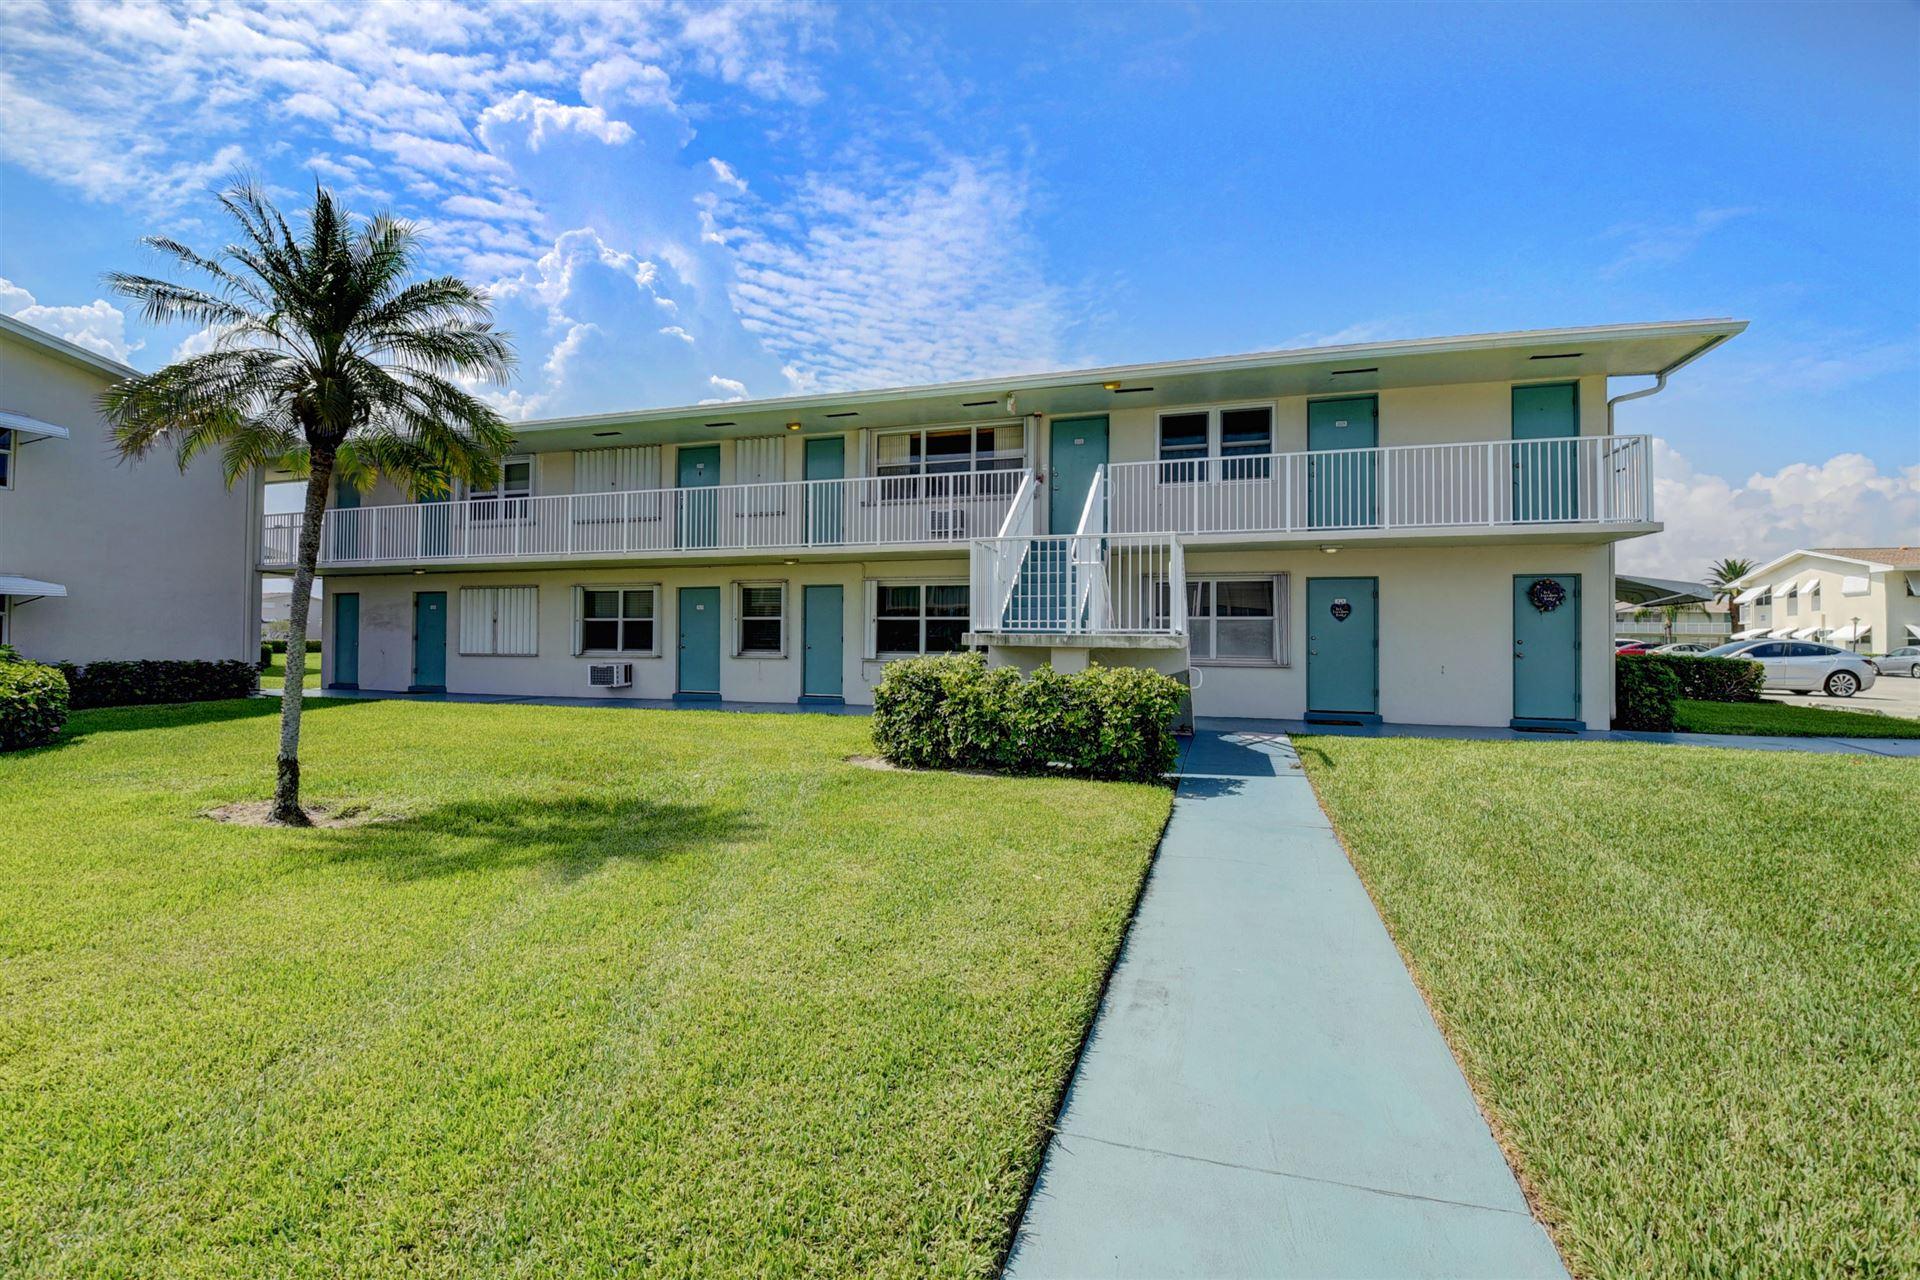 560 Horizons W #202, Boynton Beach, FL 33435 - #: RX-10639143